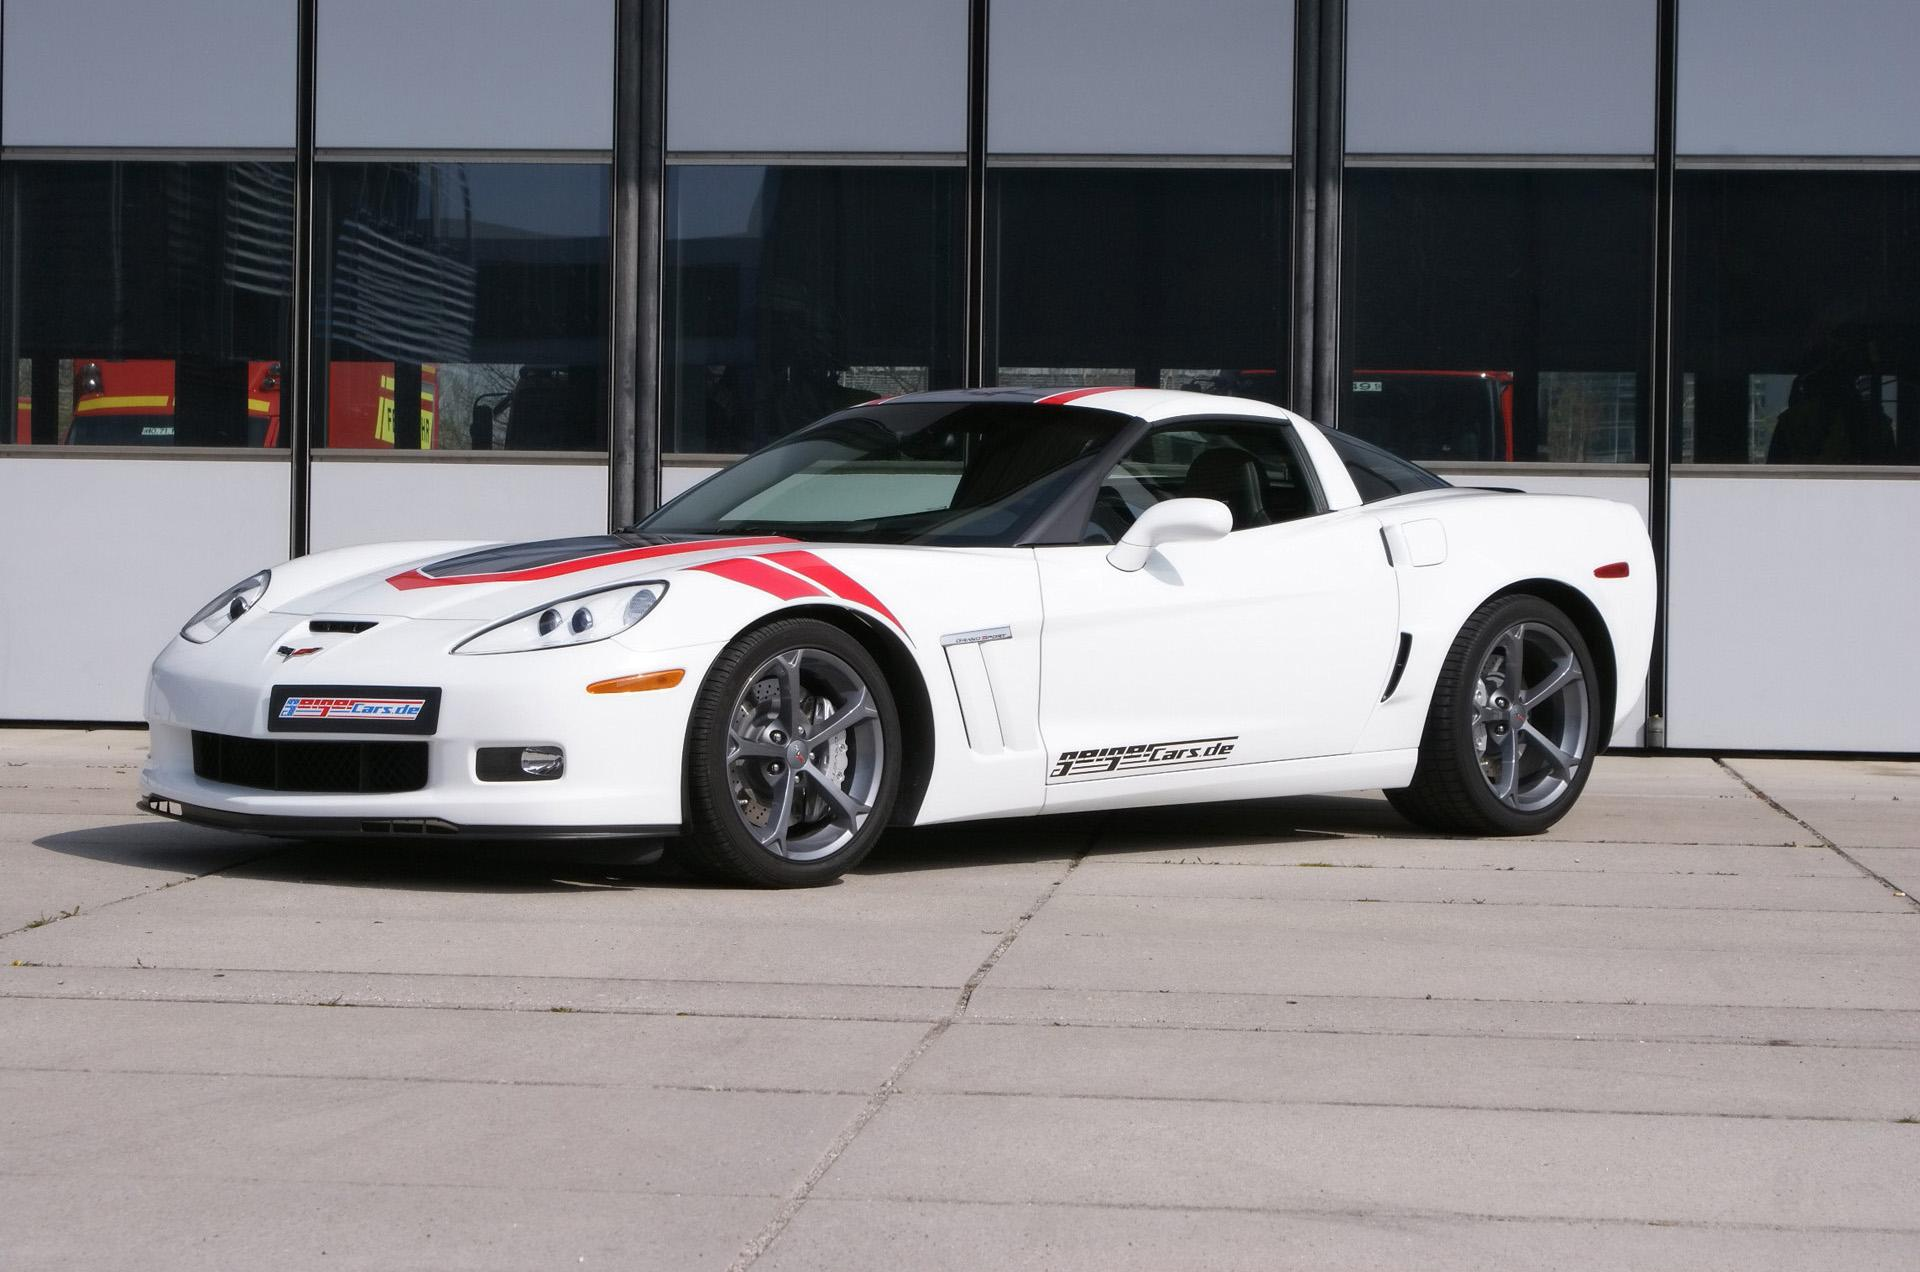 2010 Geiger Corvette Grand Sport News and Information